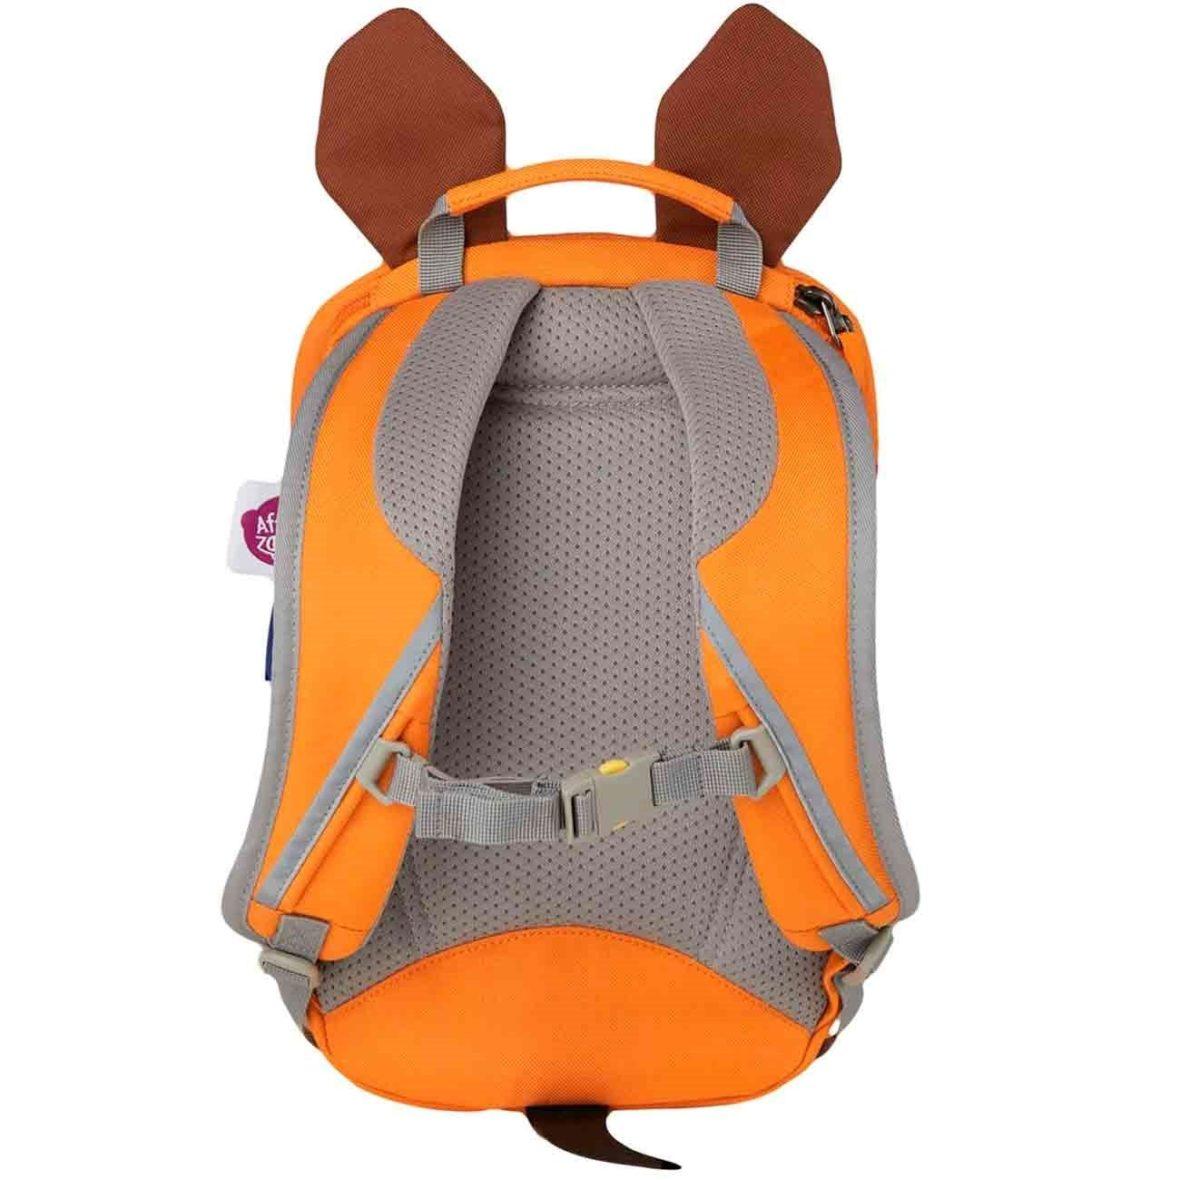 Affenzahn Rygsaek Backpack Mouse Mus Boernehavetaske Taske 2 P